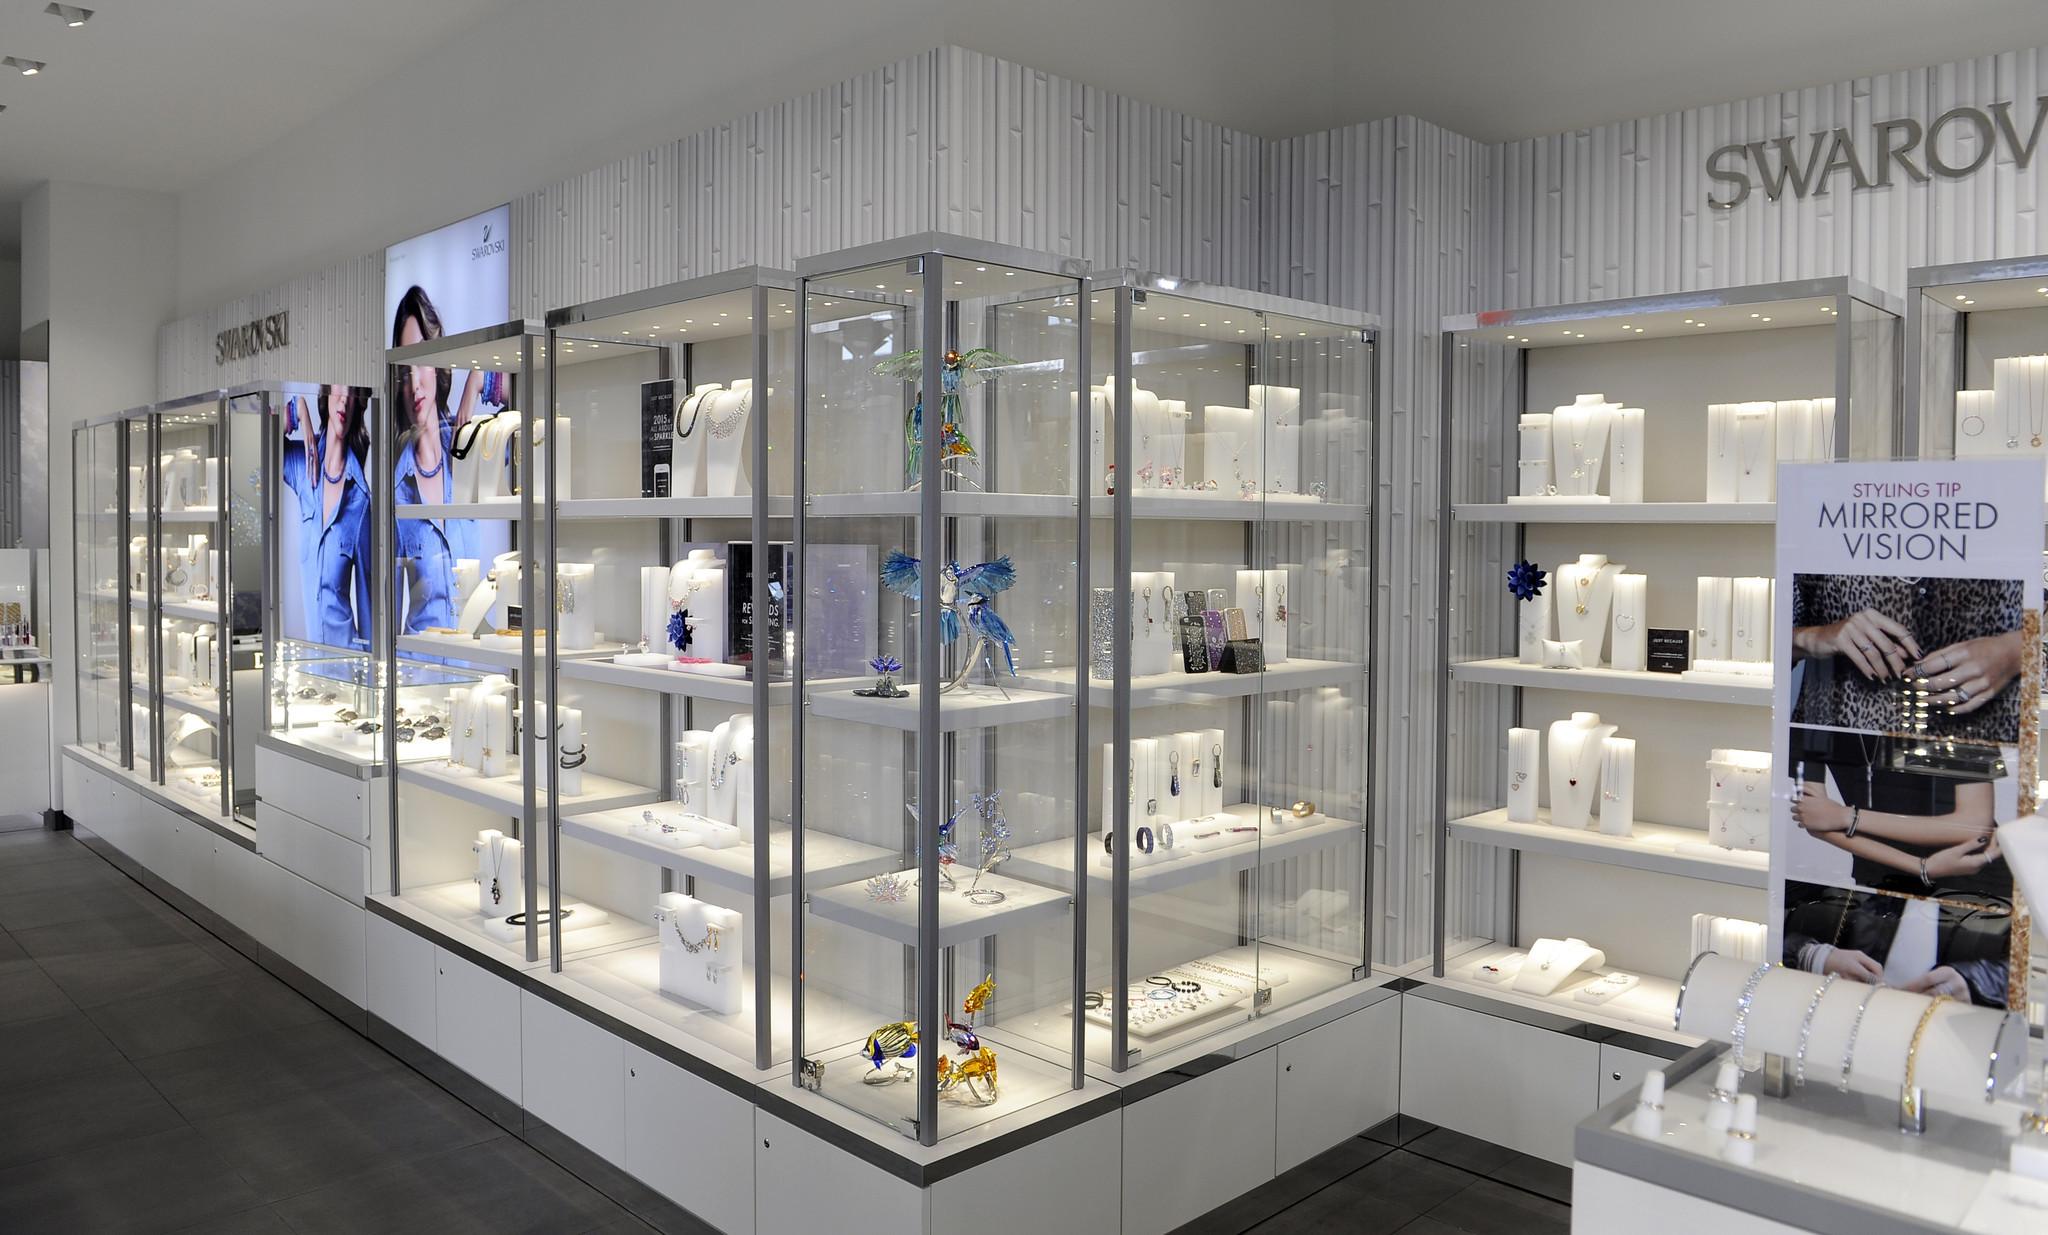 columbia malls swarovski gets a glam makeover howard county times - Swarovski Interior Design